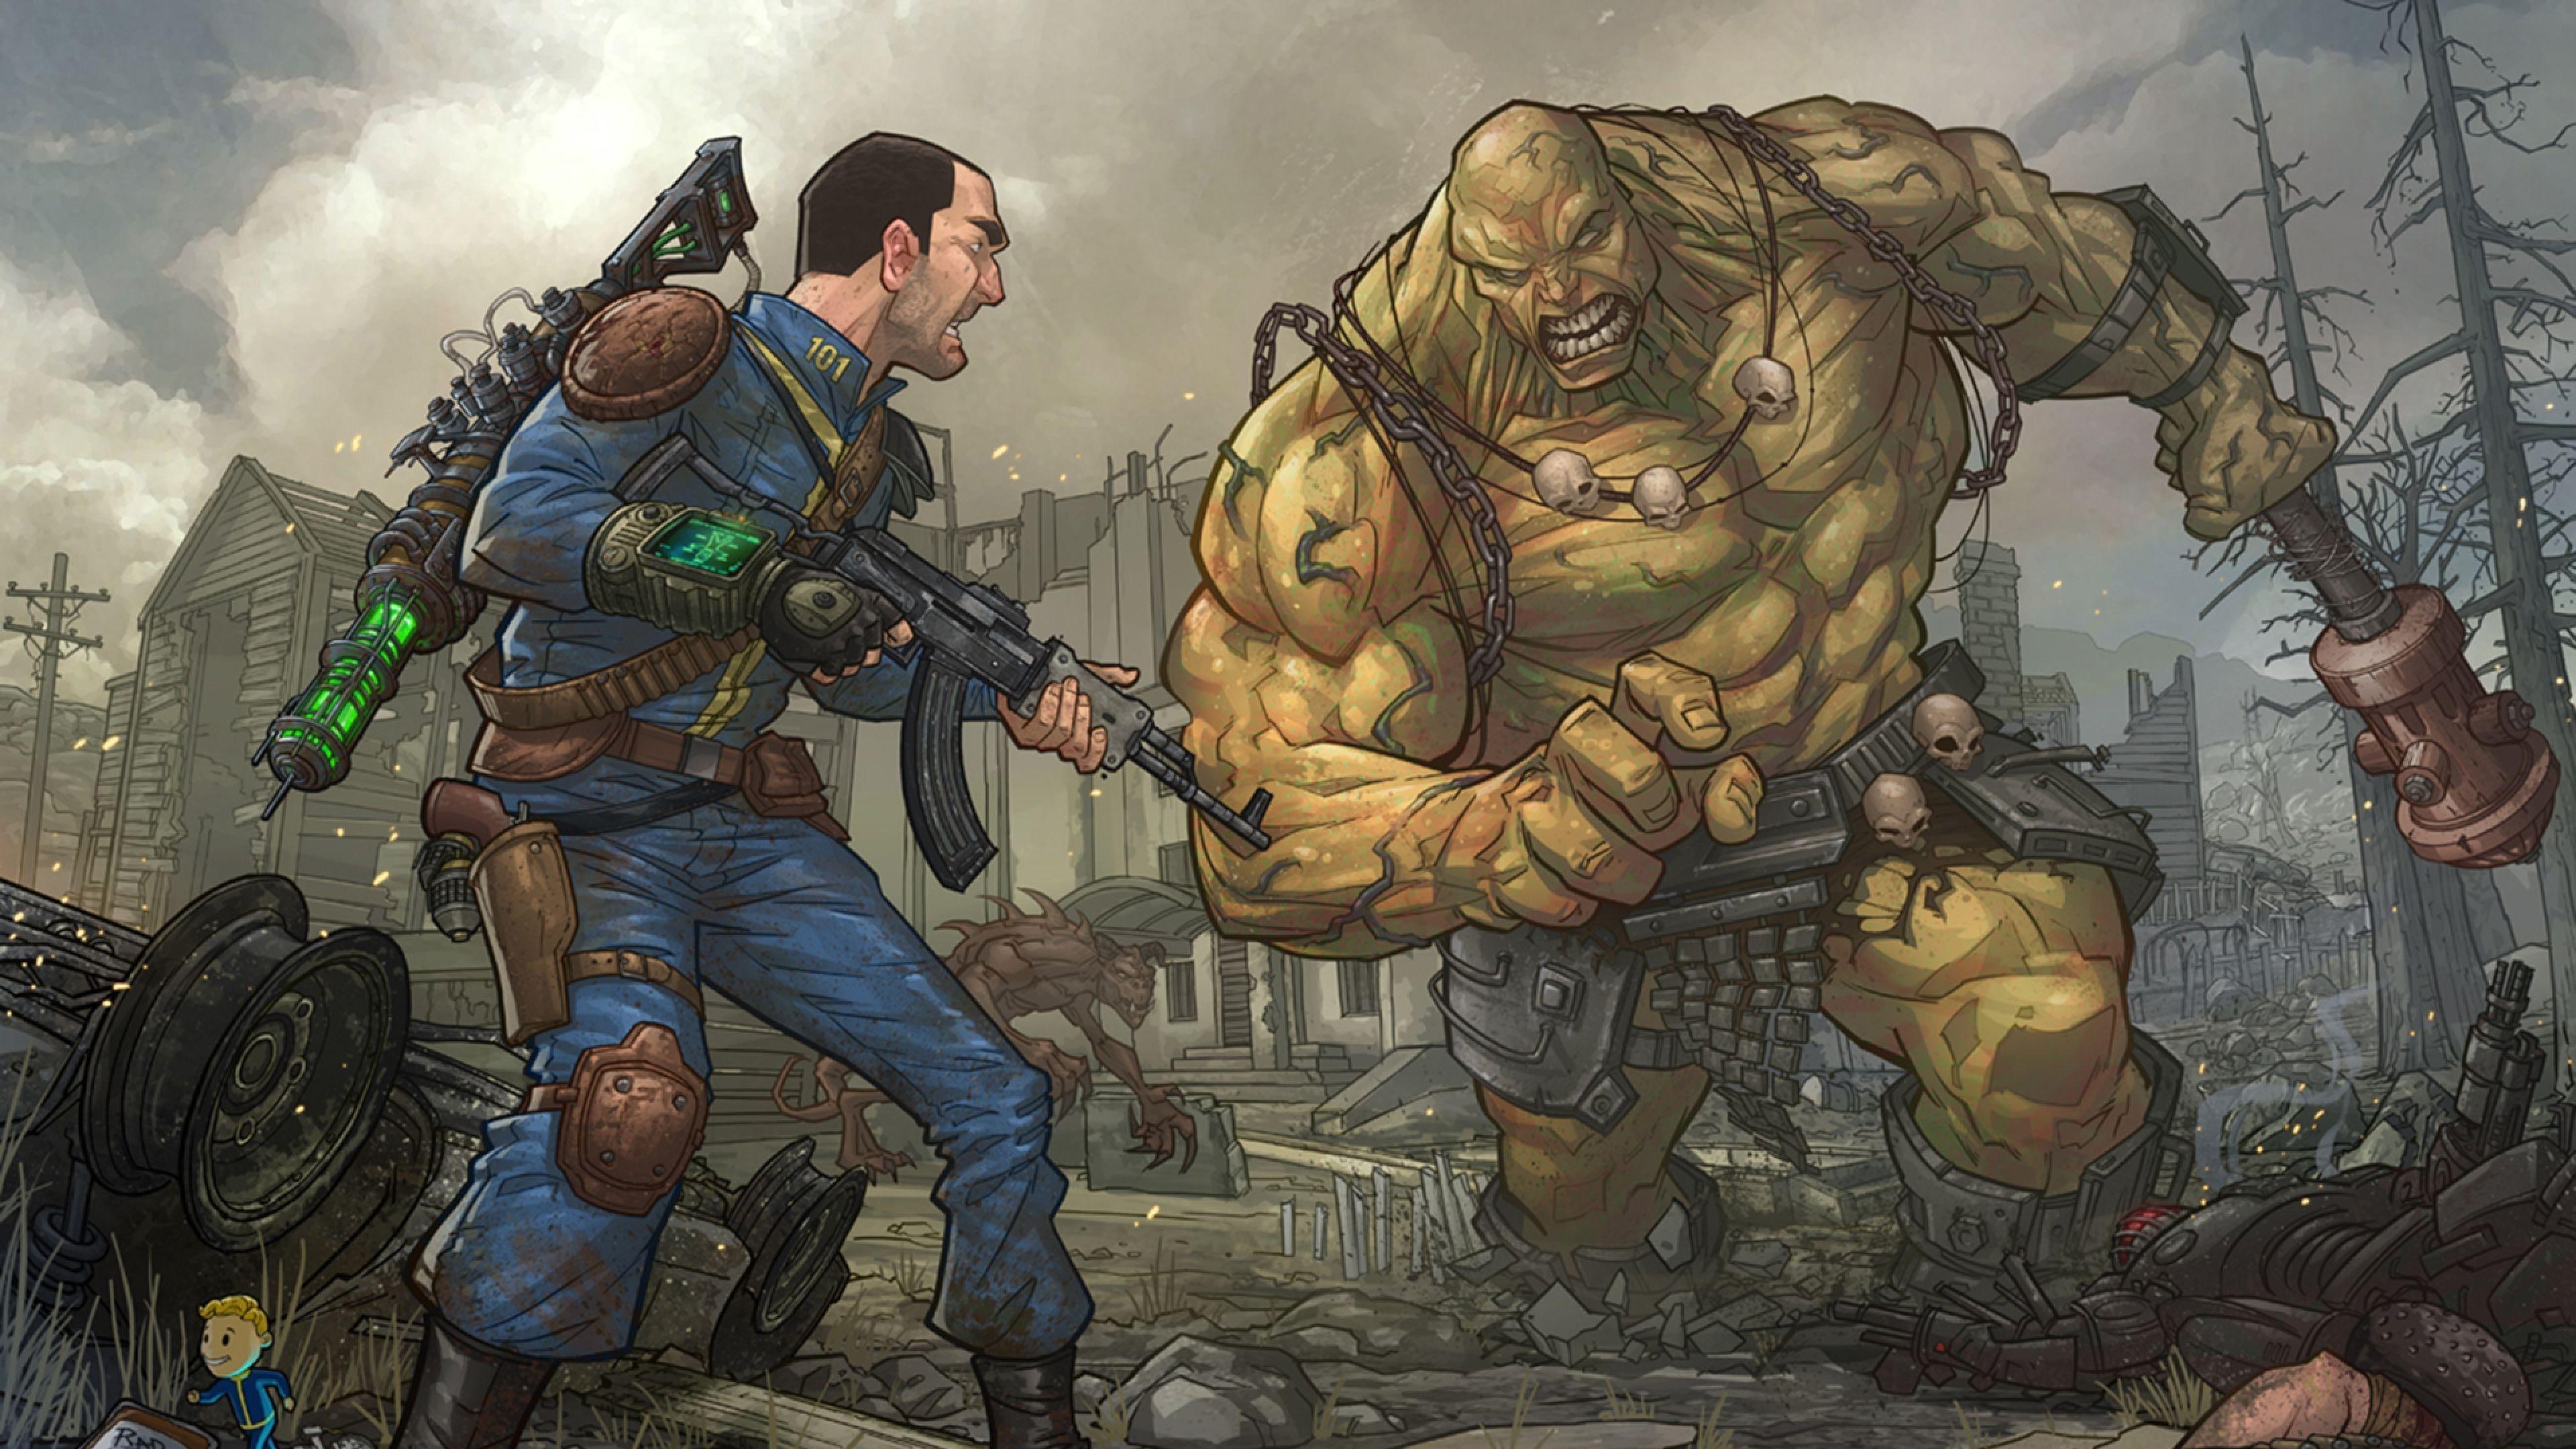 Download Wallpaper Fallout 3, Super mutant, Behemoth 4K .